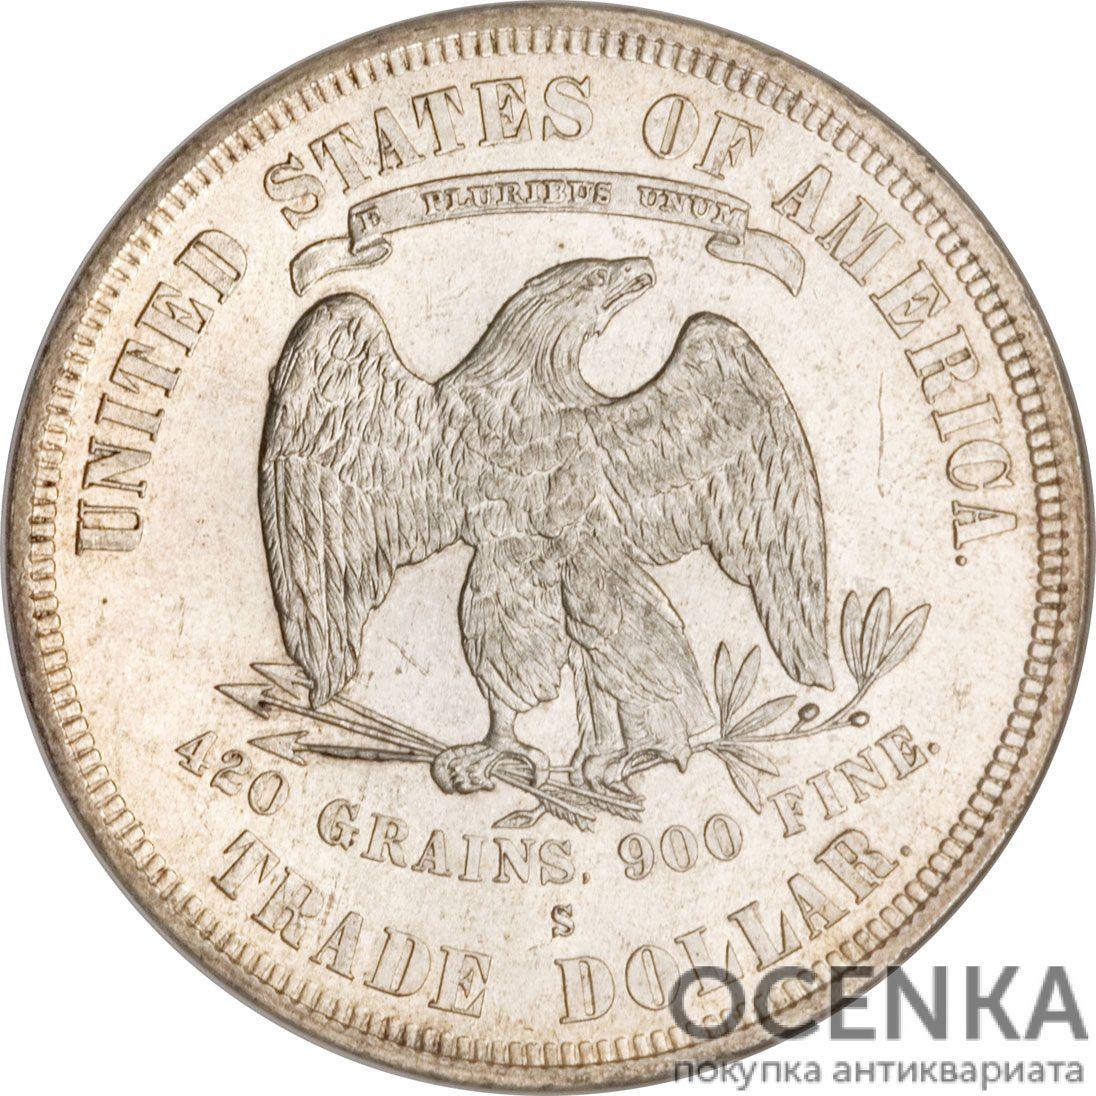 Серебряная монета 1 Доллар (One Dollar) США - 4